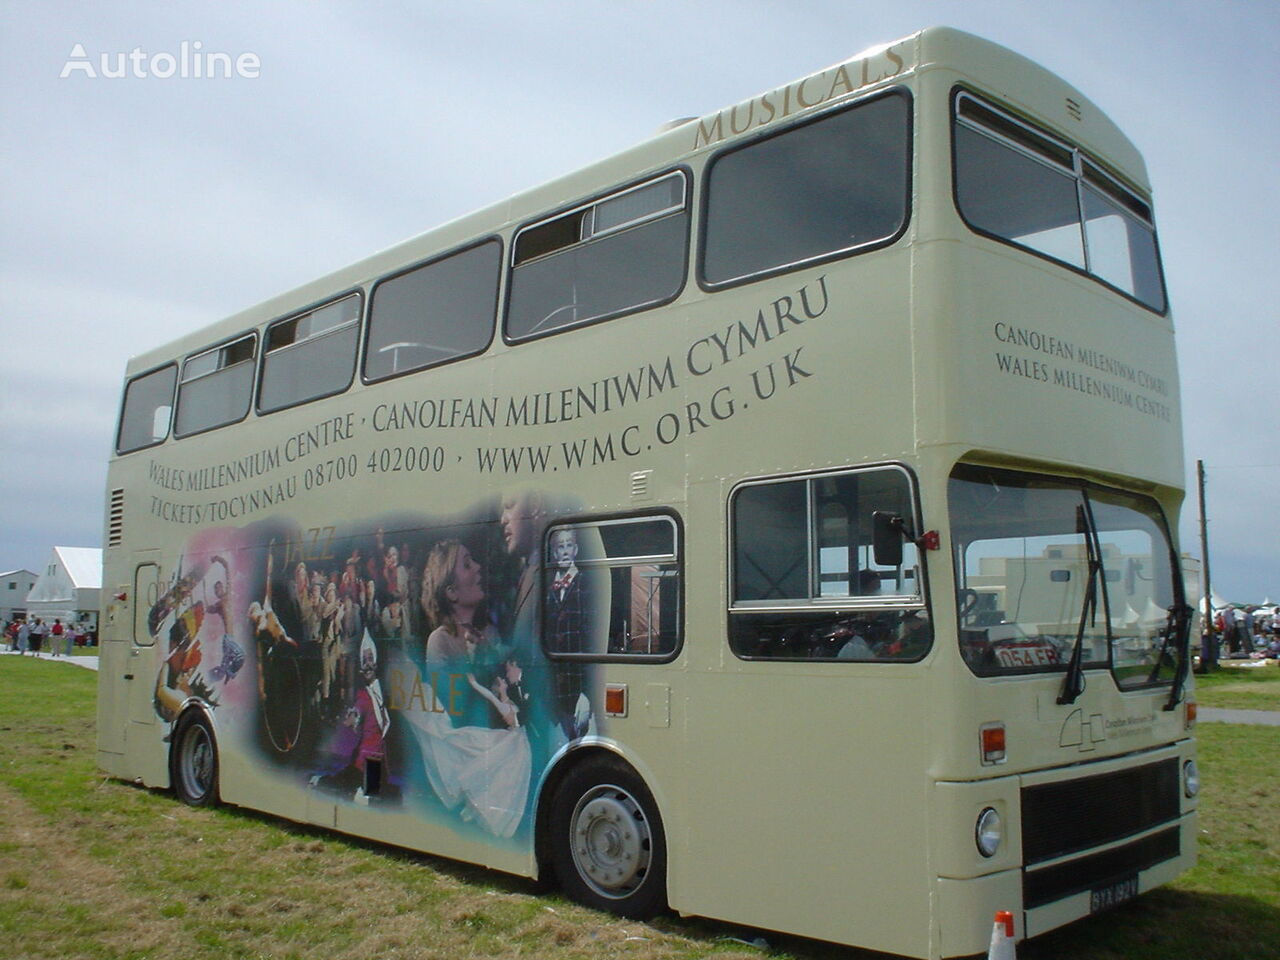 MCW METROBUS British Double Decker Bus Marketing Exhibition Training autobús de dos pisos